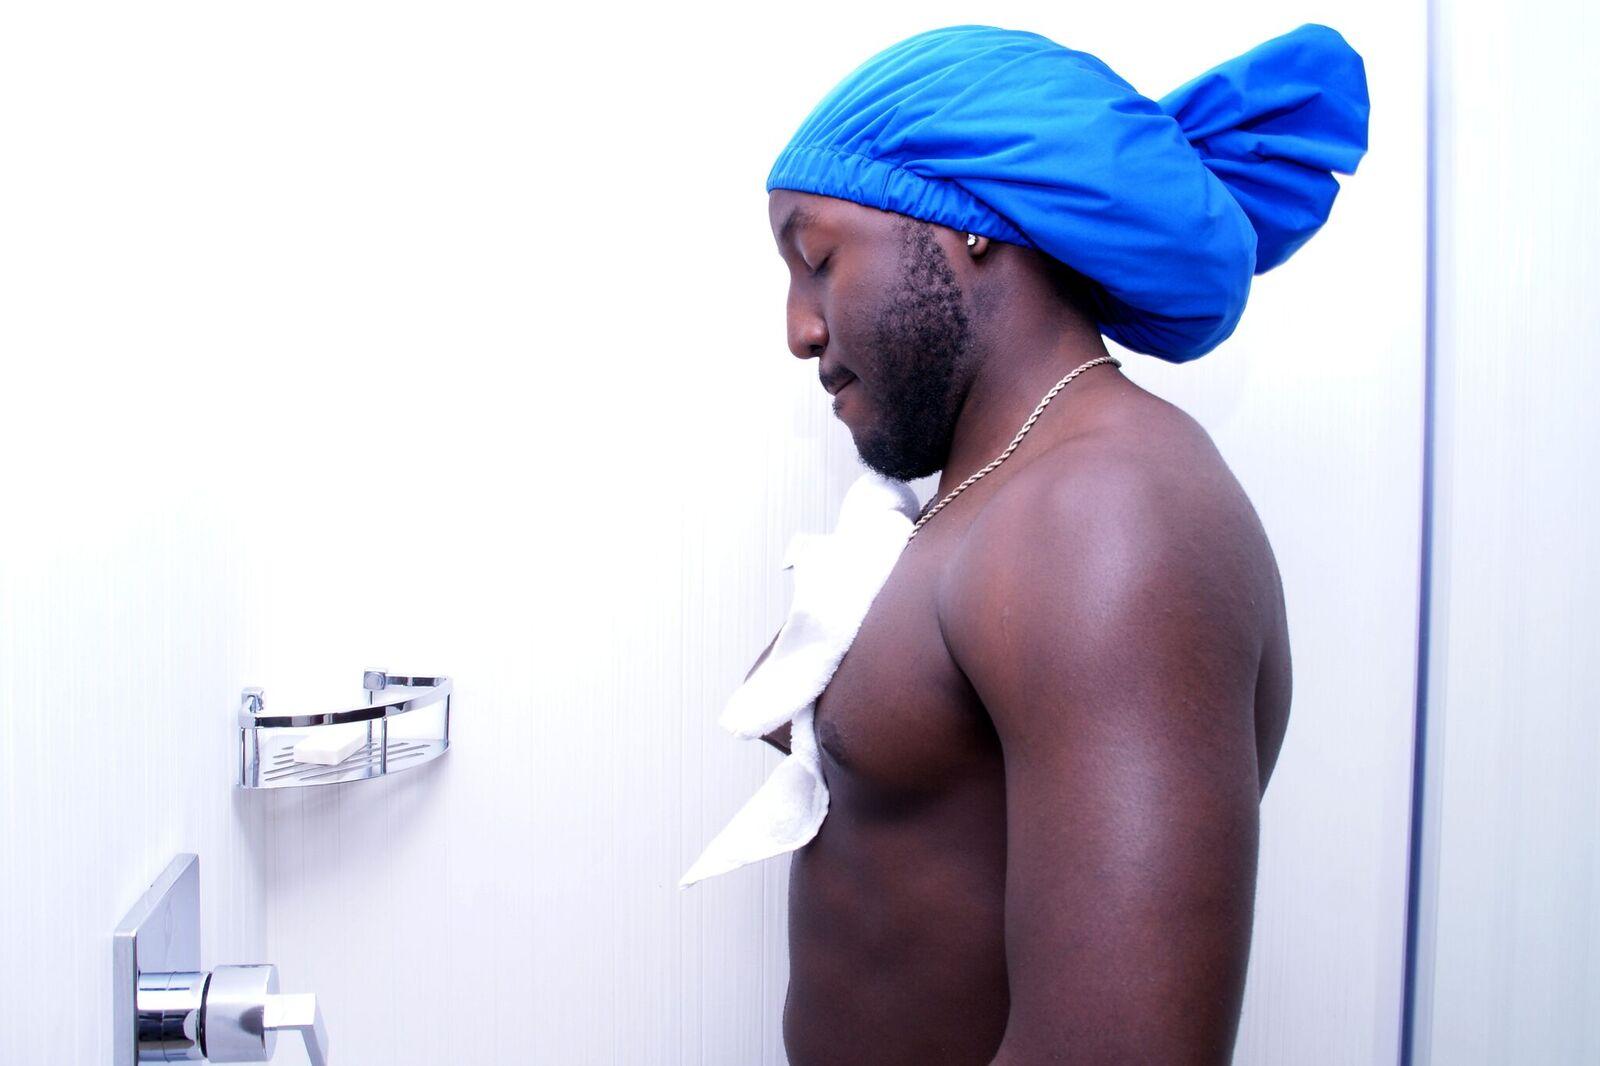 Shower Caps